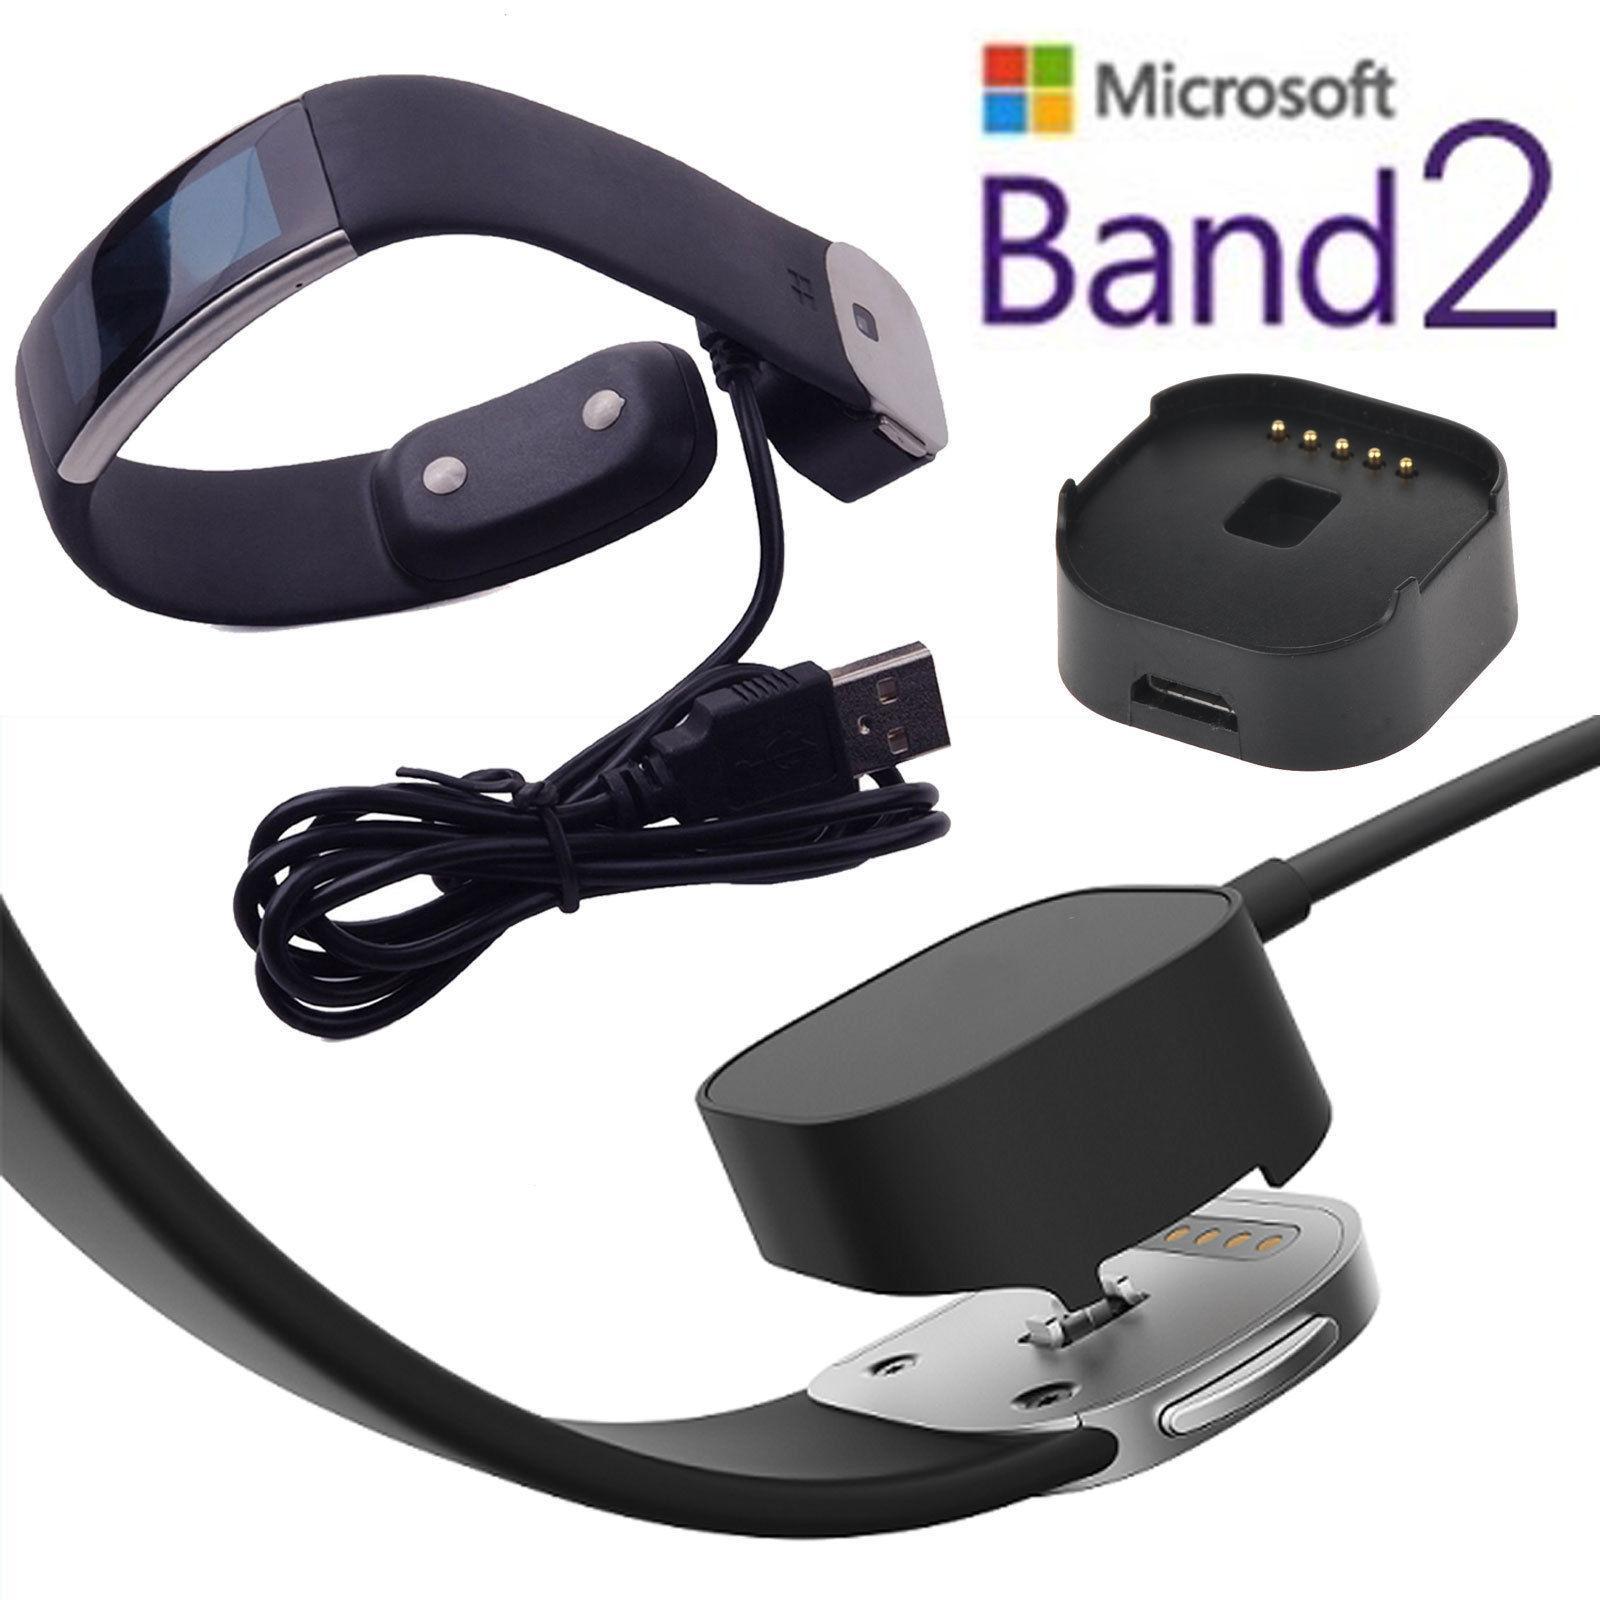 Cable de carga del cargador del cable USB para la pulsera elegante de la pulsera de la venda 2 de Microsoft